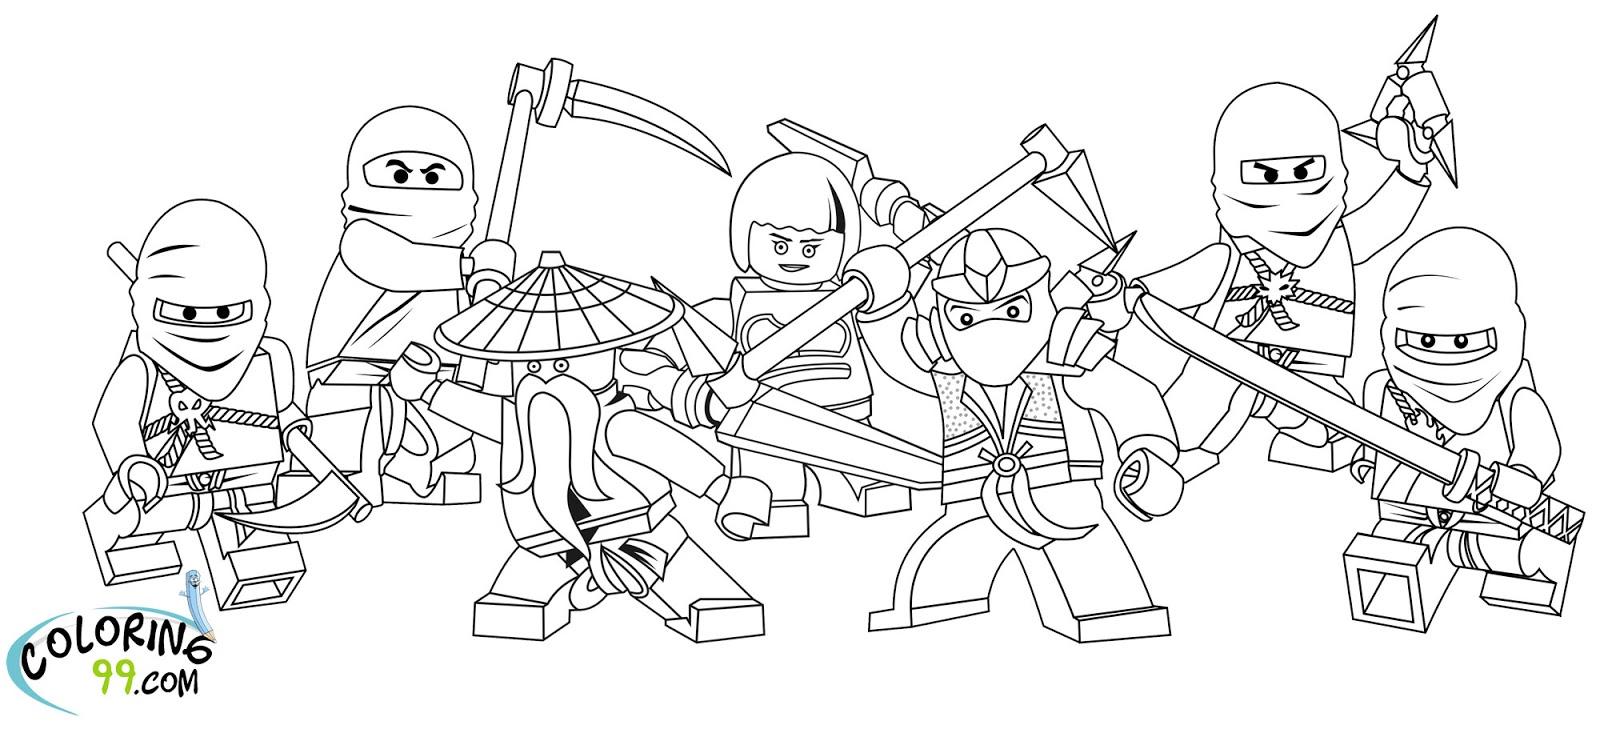 Coloriage ninjago gratuit - dessin a imprimer #81